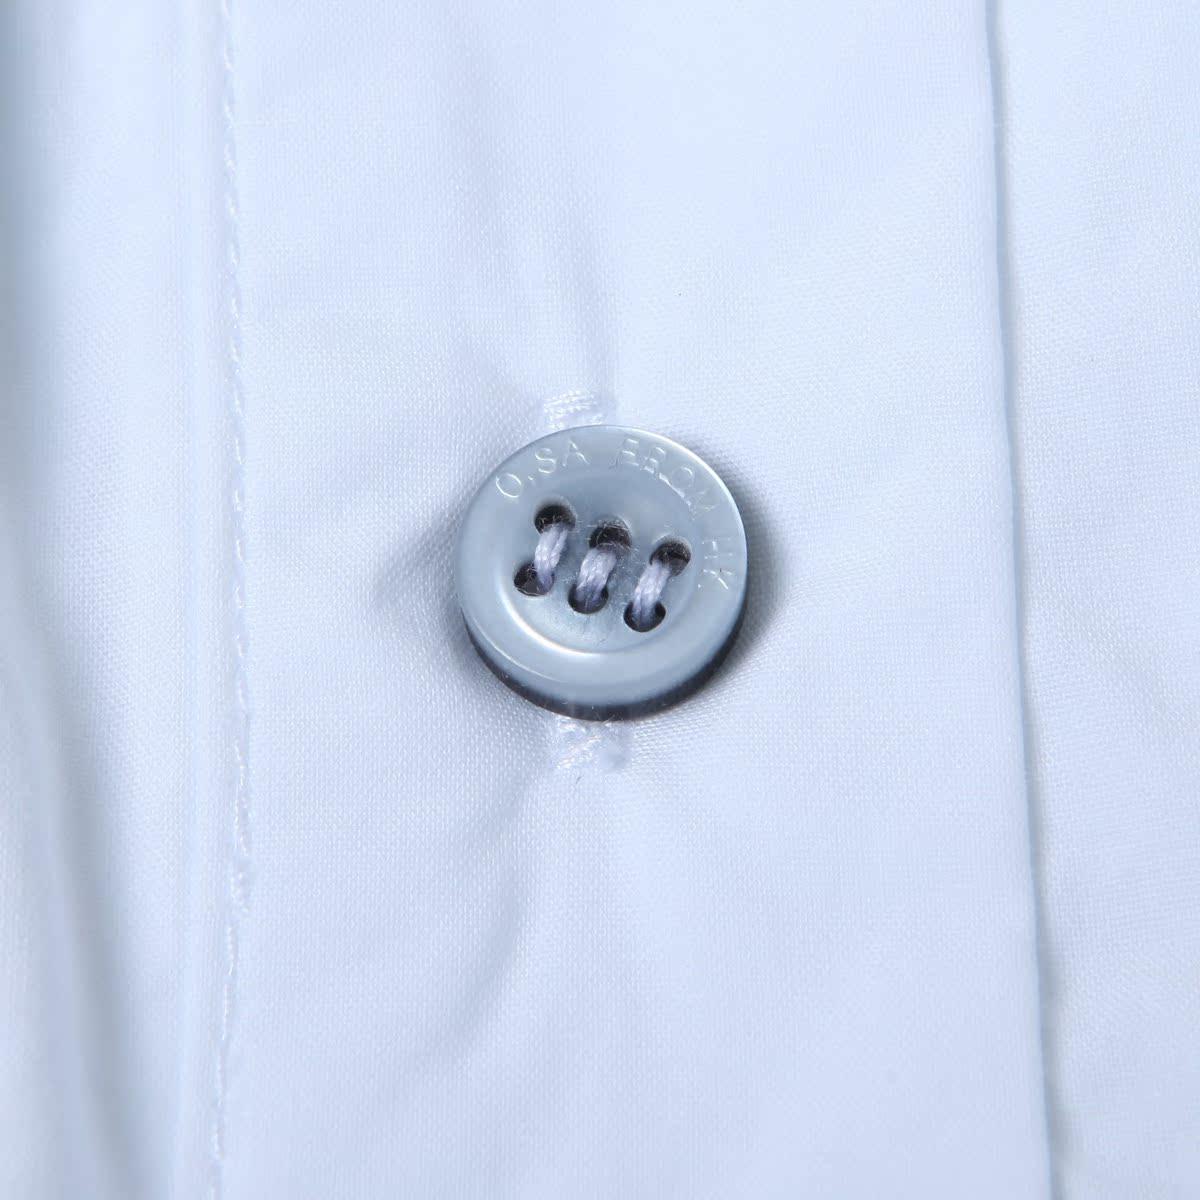 женская рубашка OSA sc90301 OSA2011 OL C90301